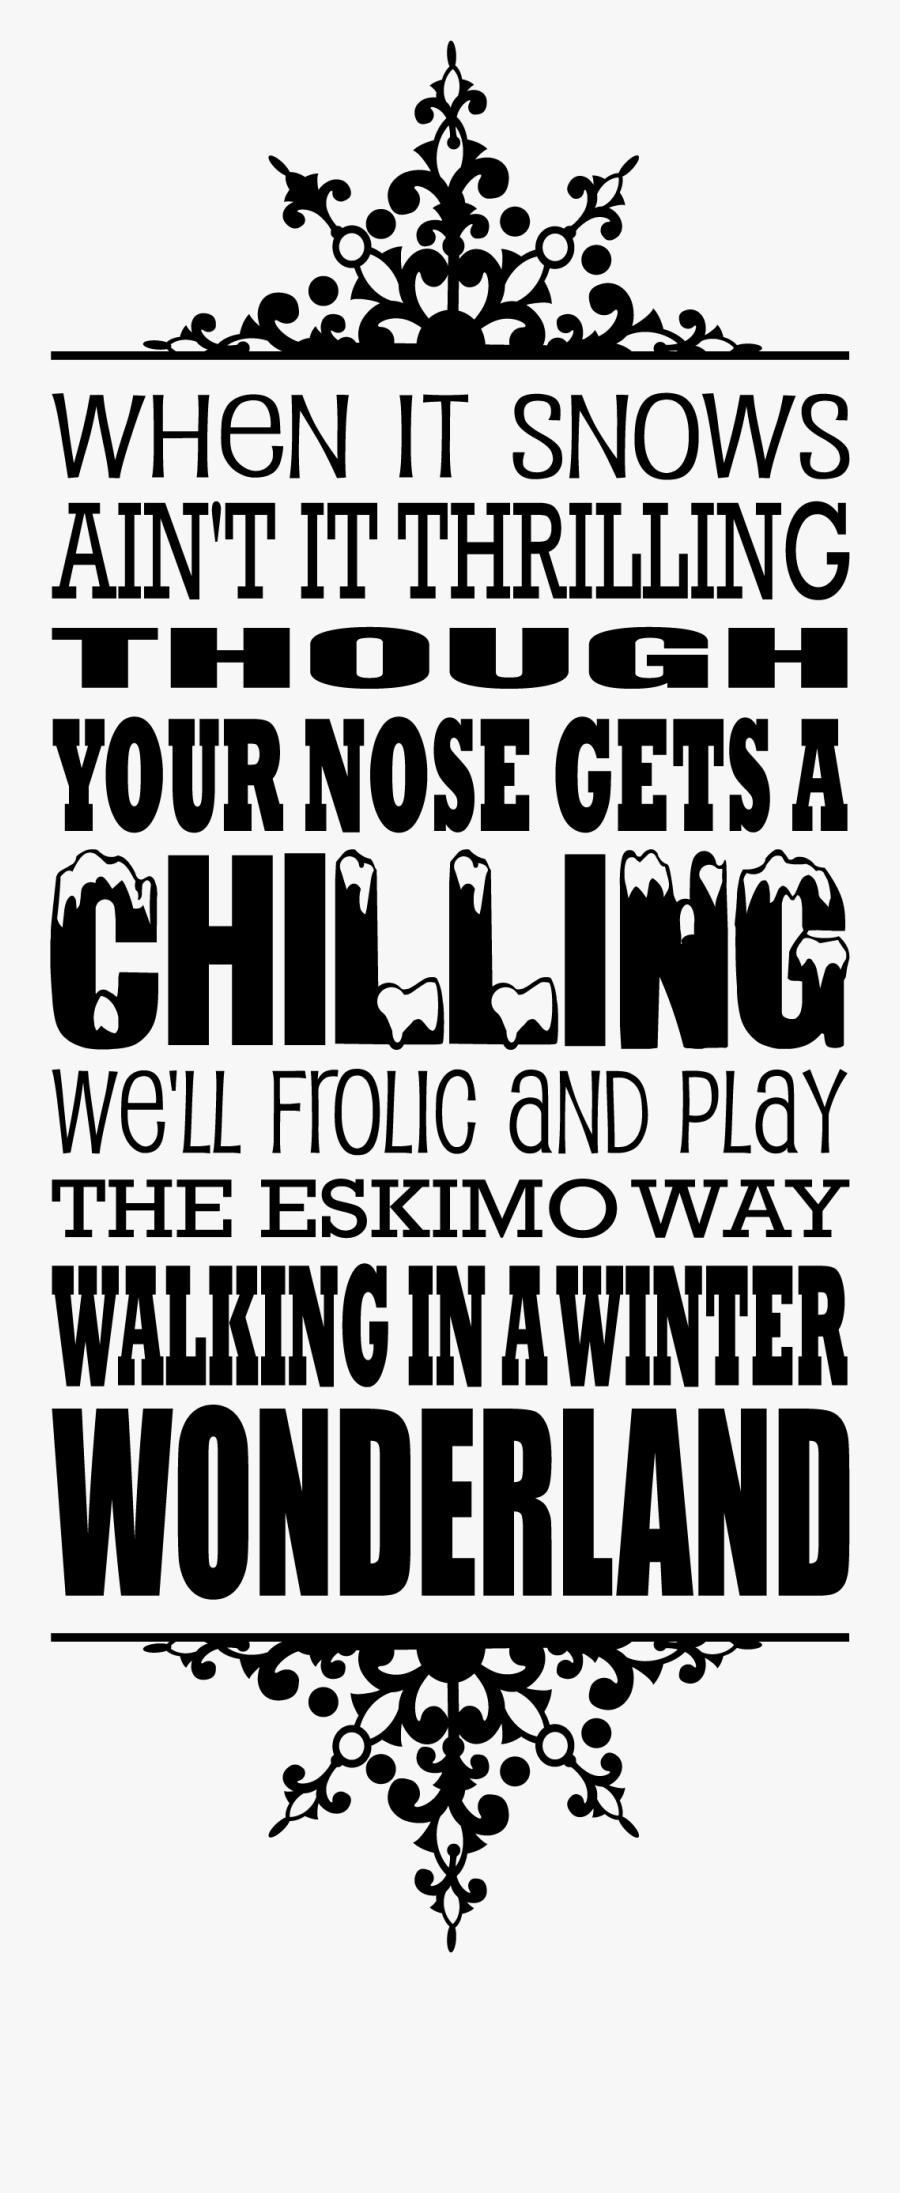 Transparent Walking In A Winter Wonderland Clipart - Winter Wonderland Clipart Black And White, Transparent Clipart